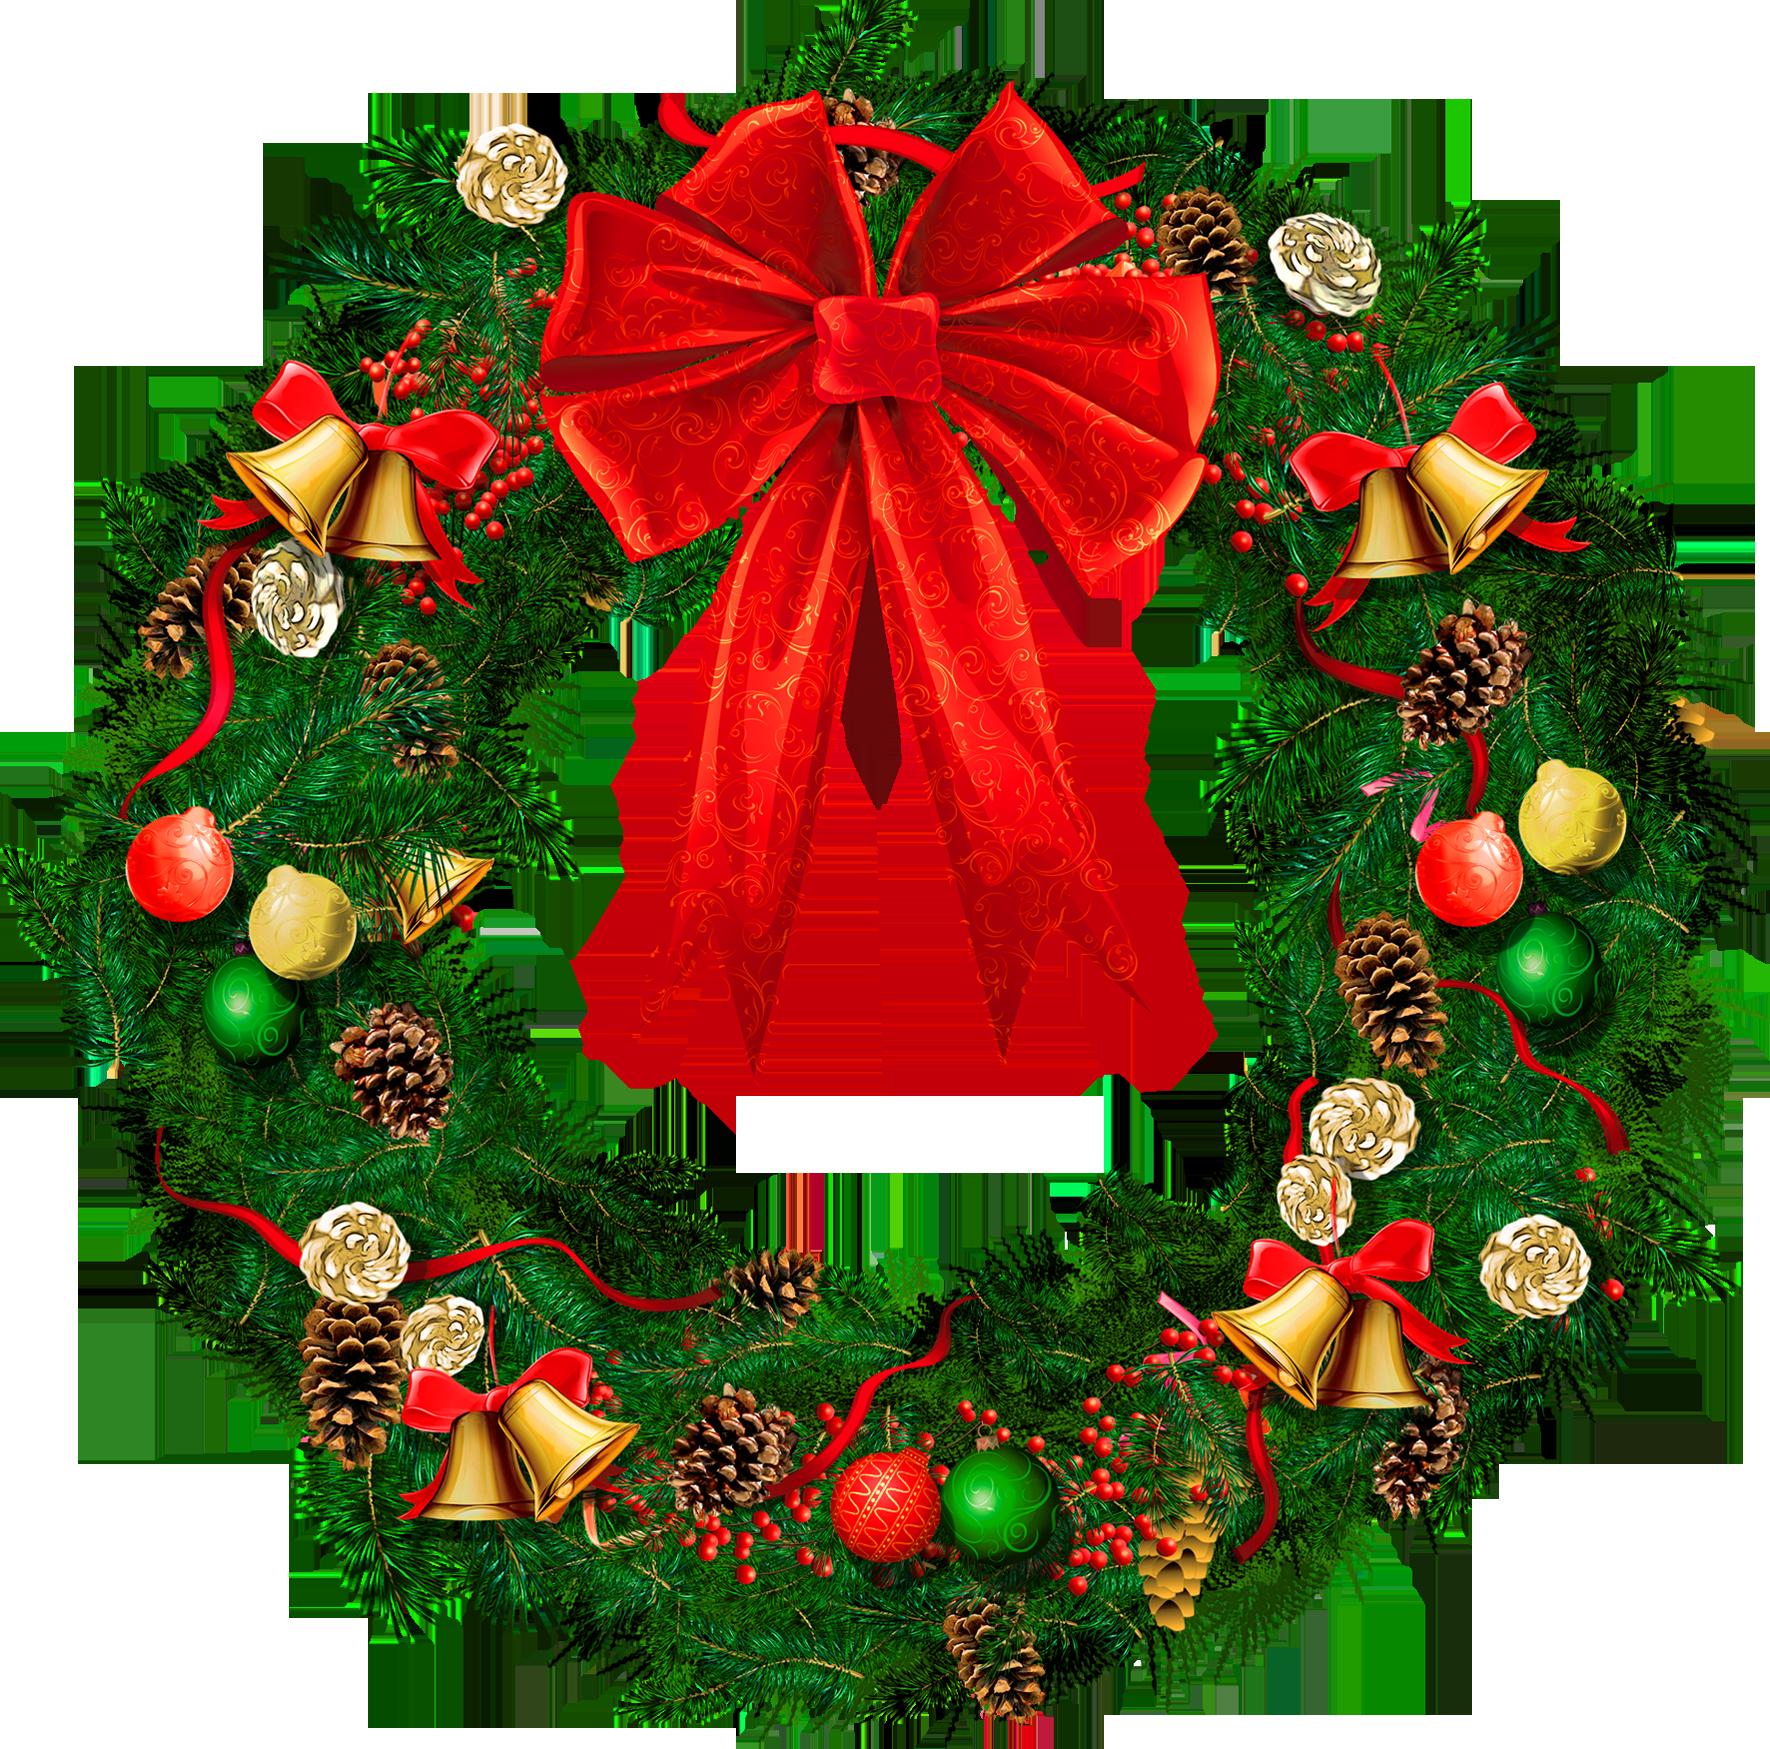 Christmas Wreath Png Image 2.